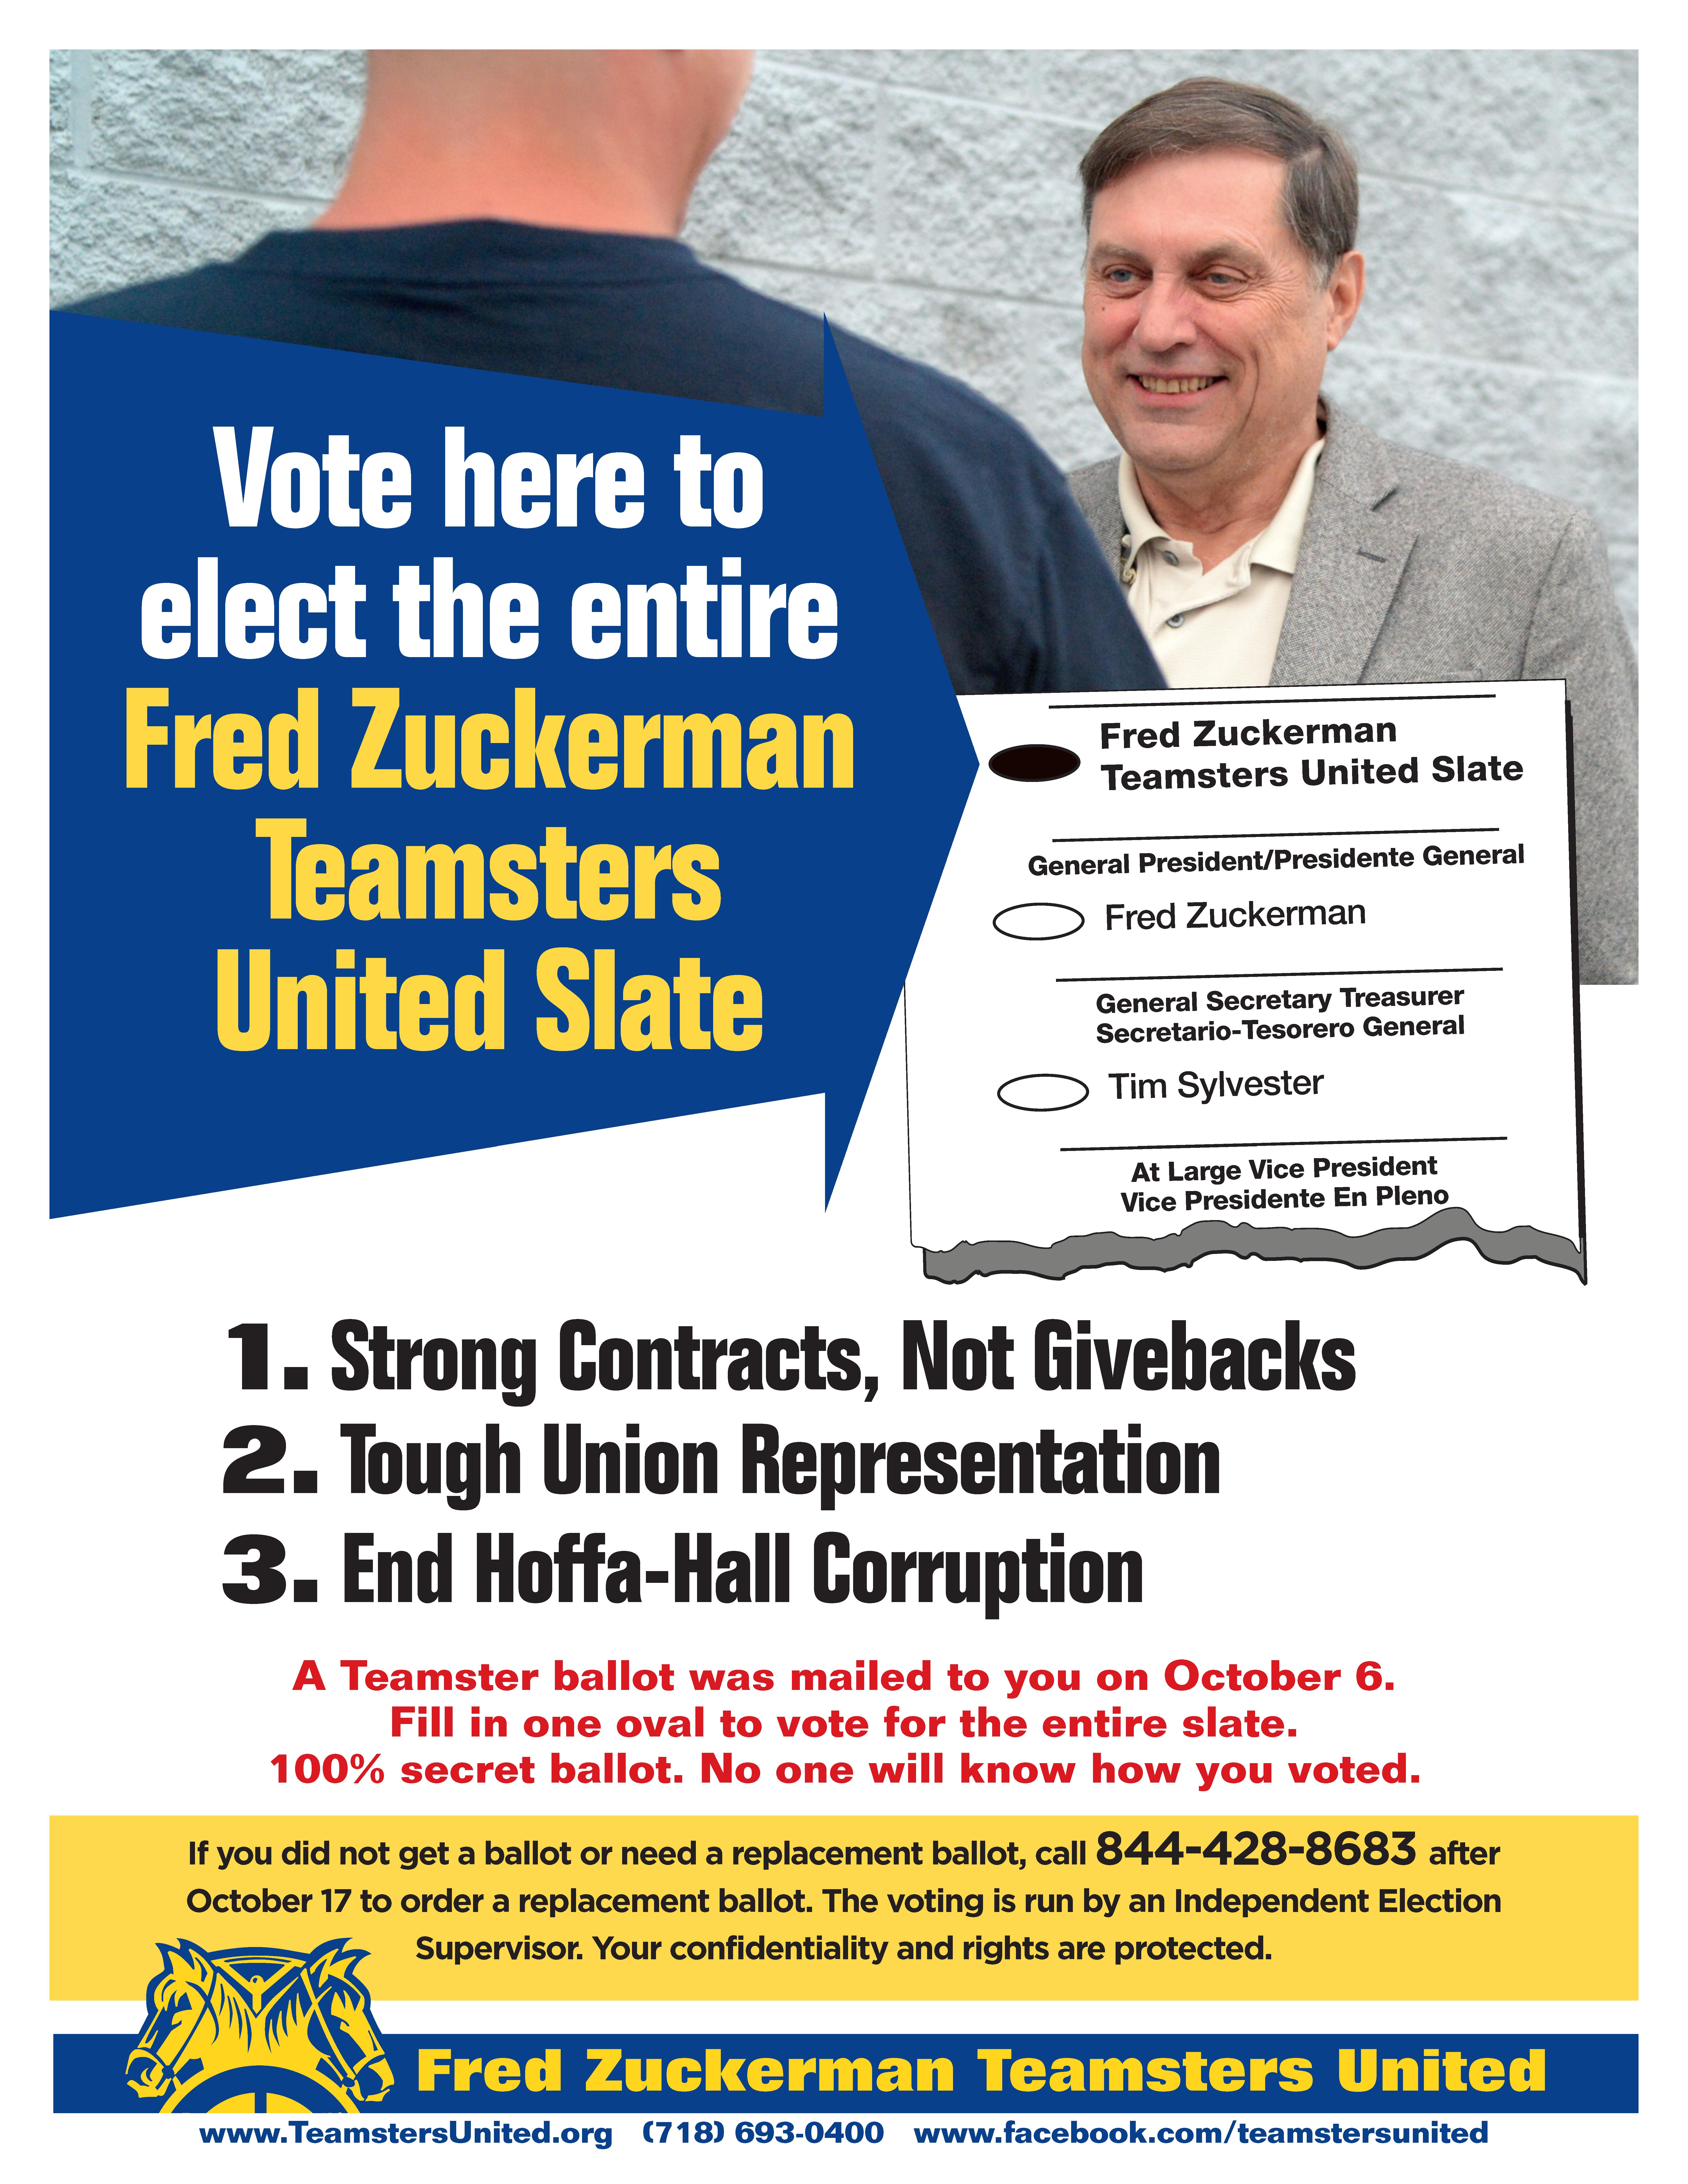 sample_ballot_flyer_10-10-16.png